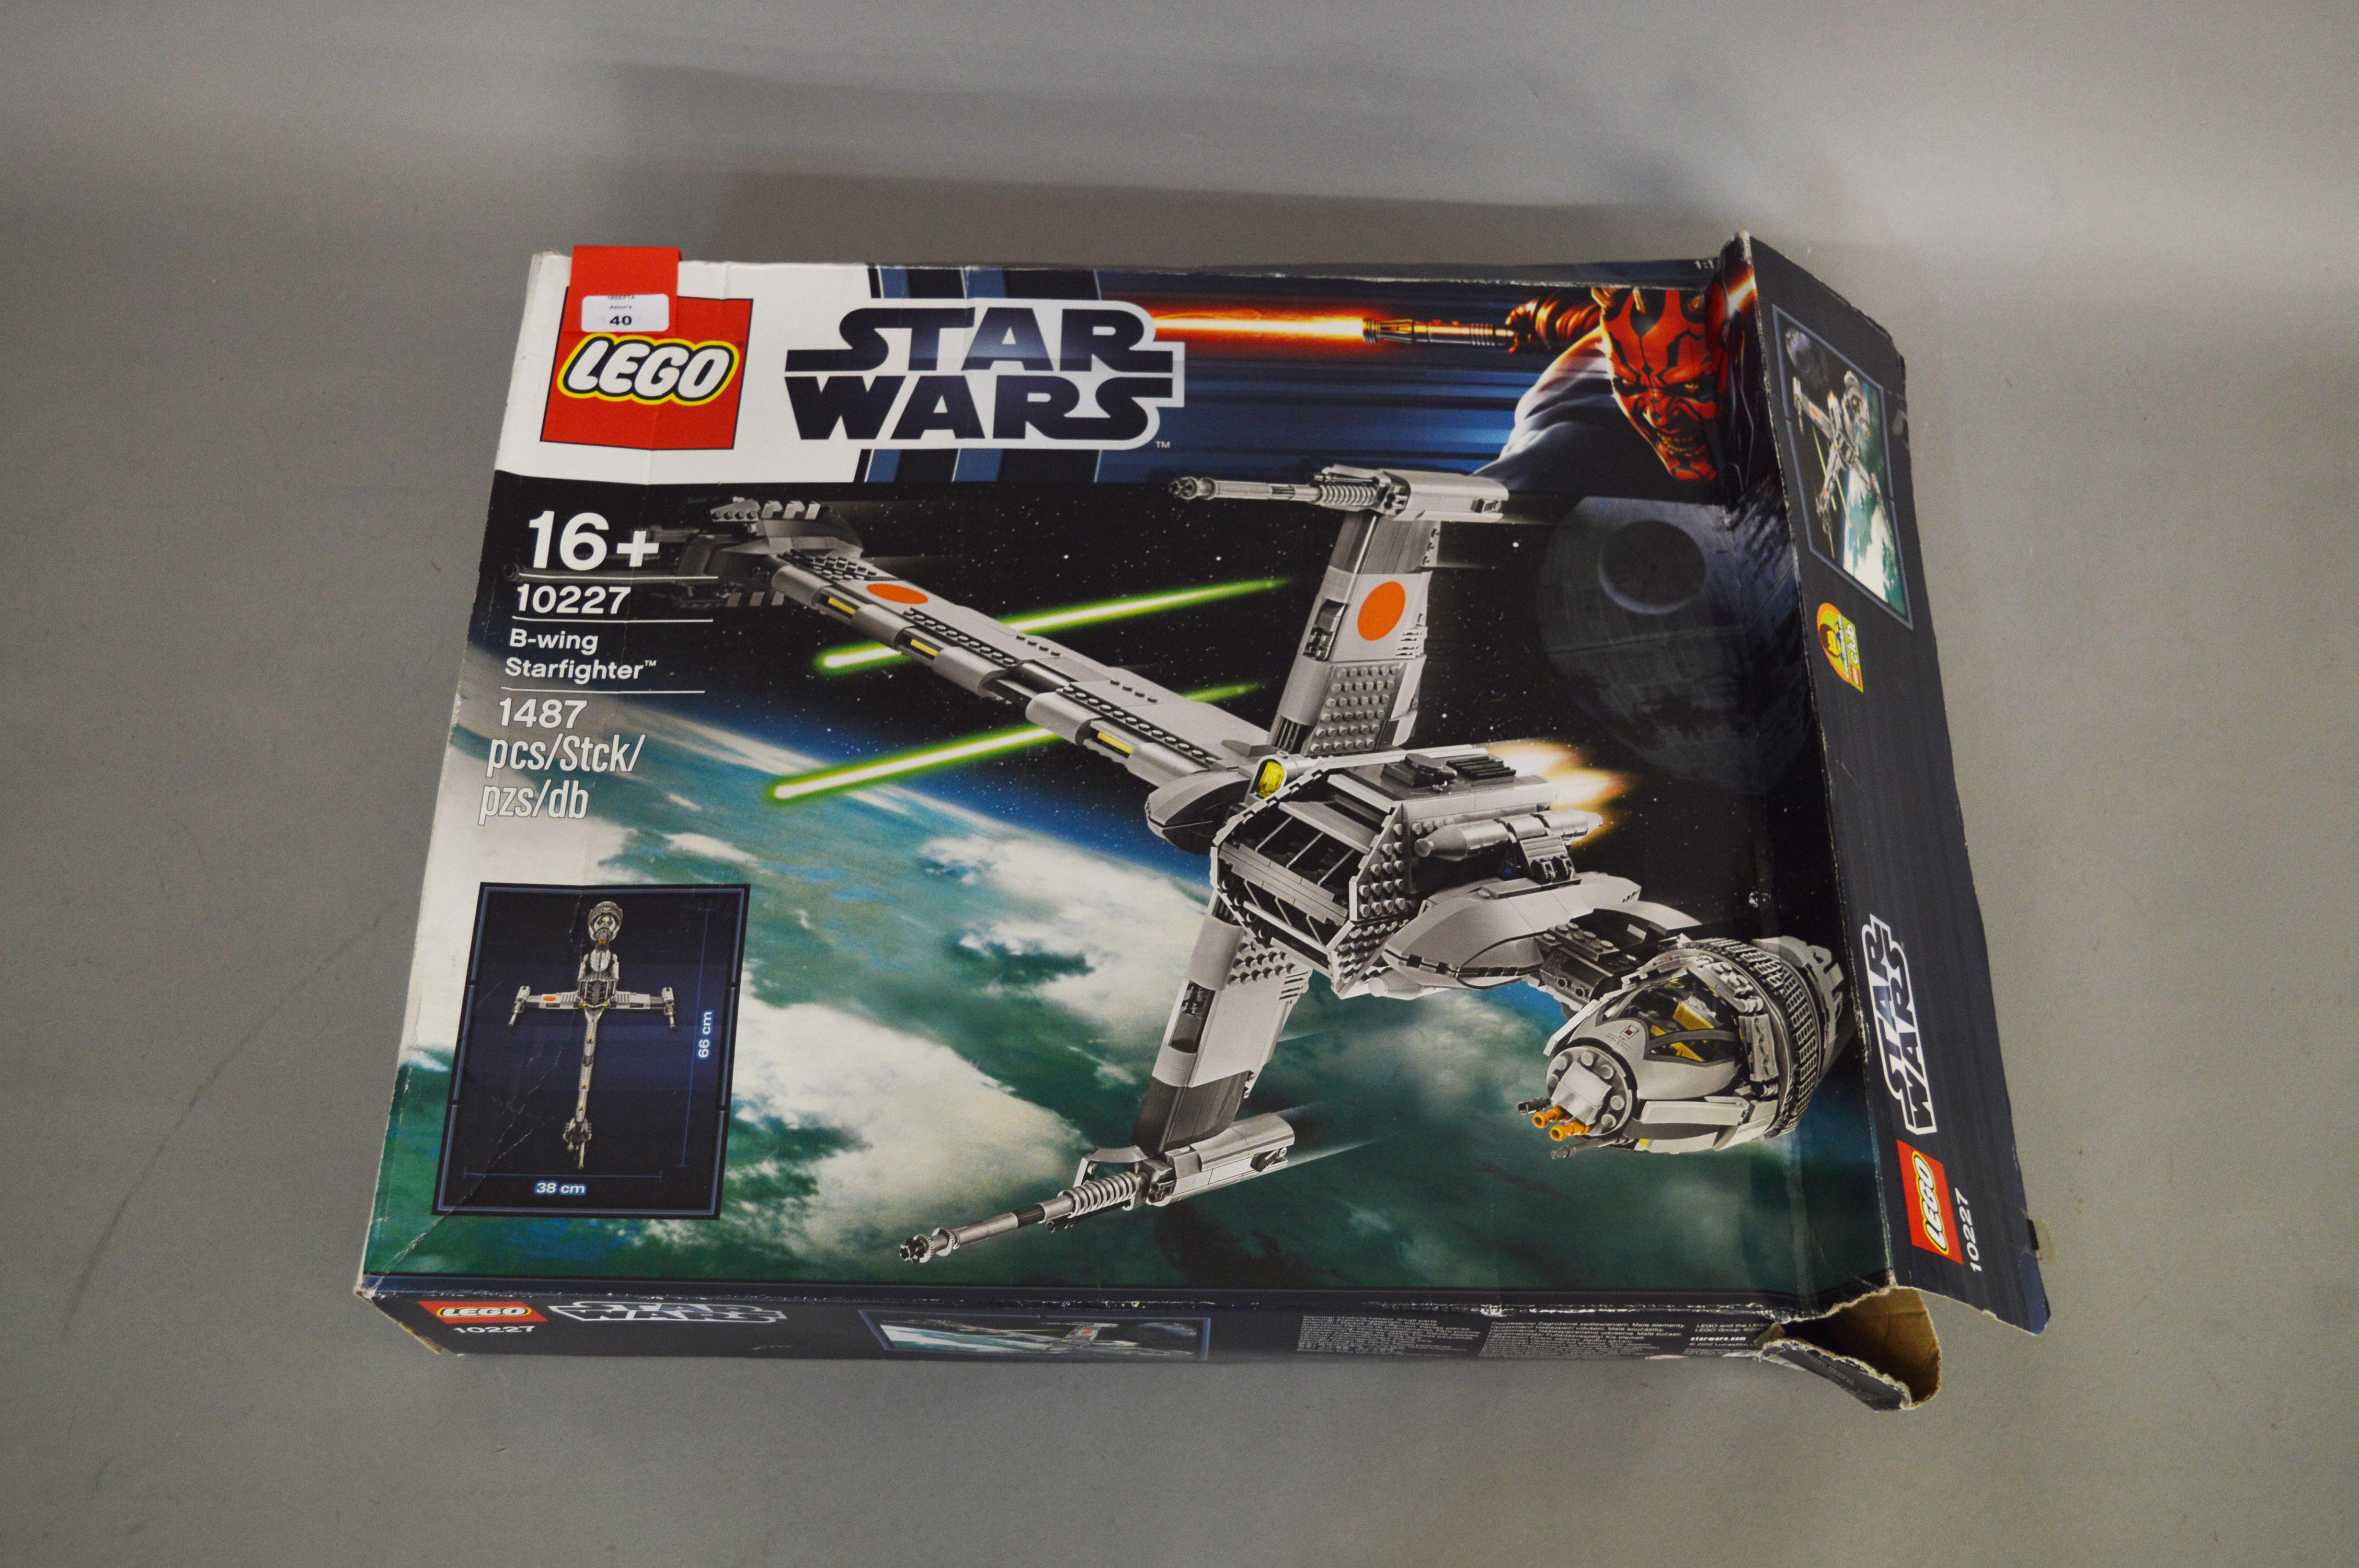 Lot 40 - Lego Star Wars 10227 B-wing Starfighter.